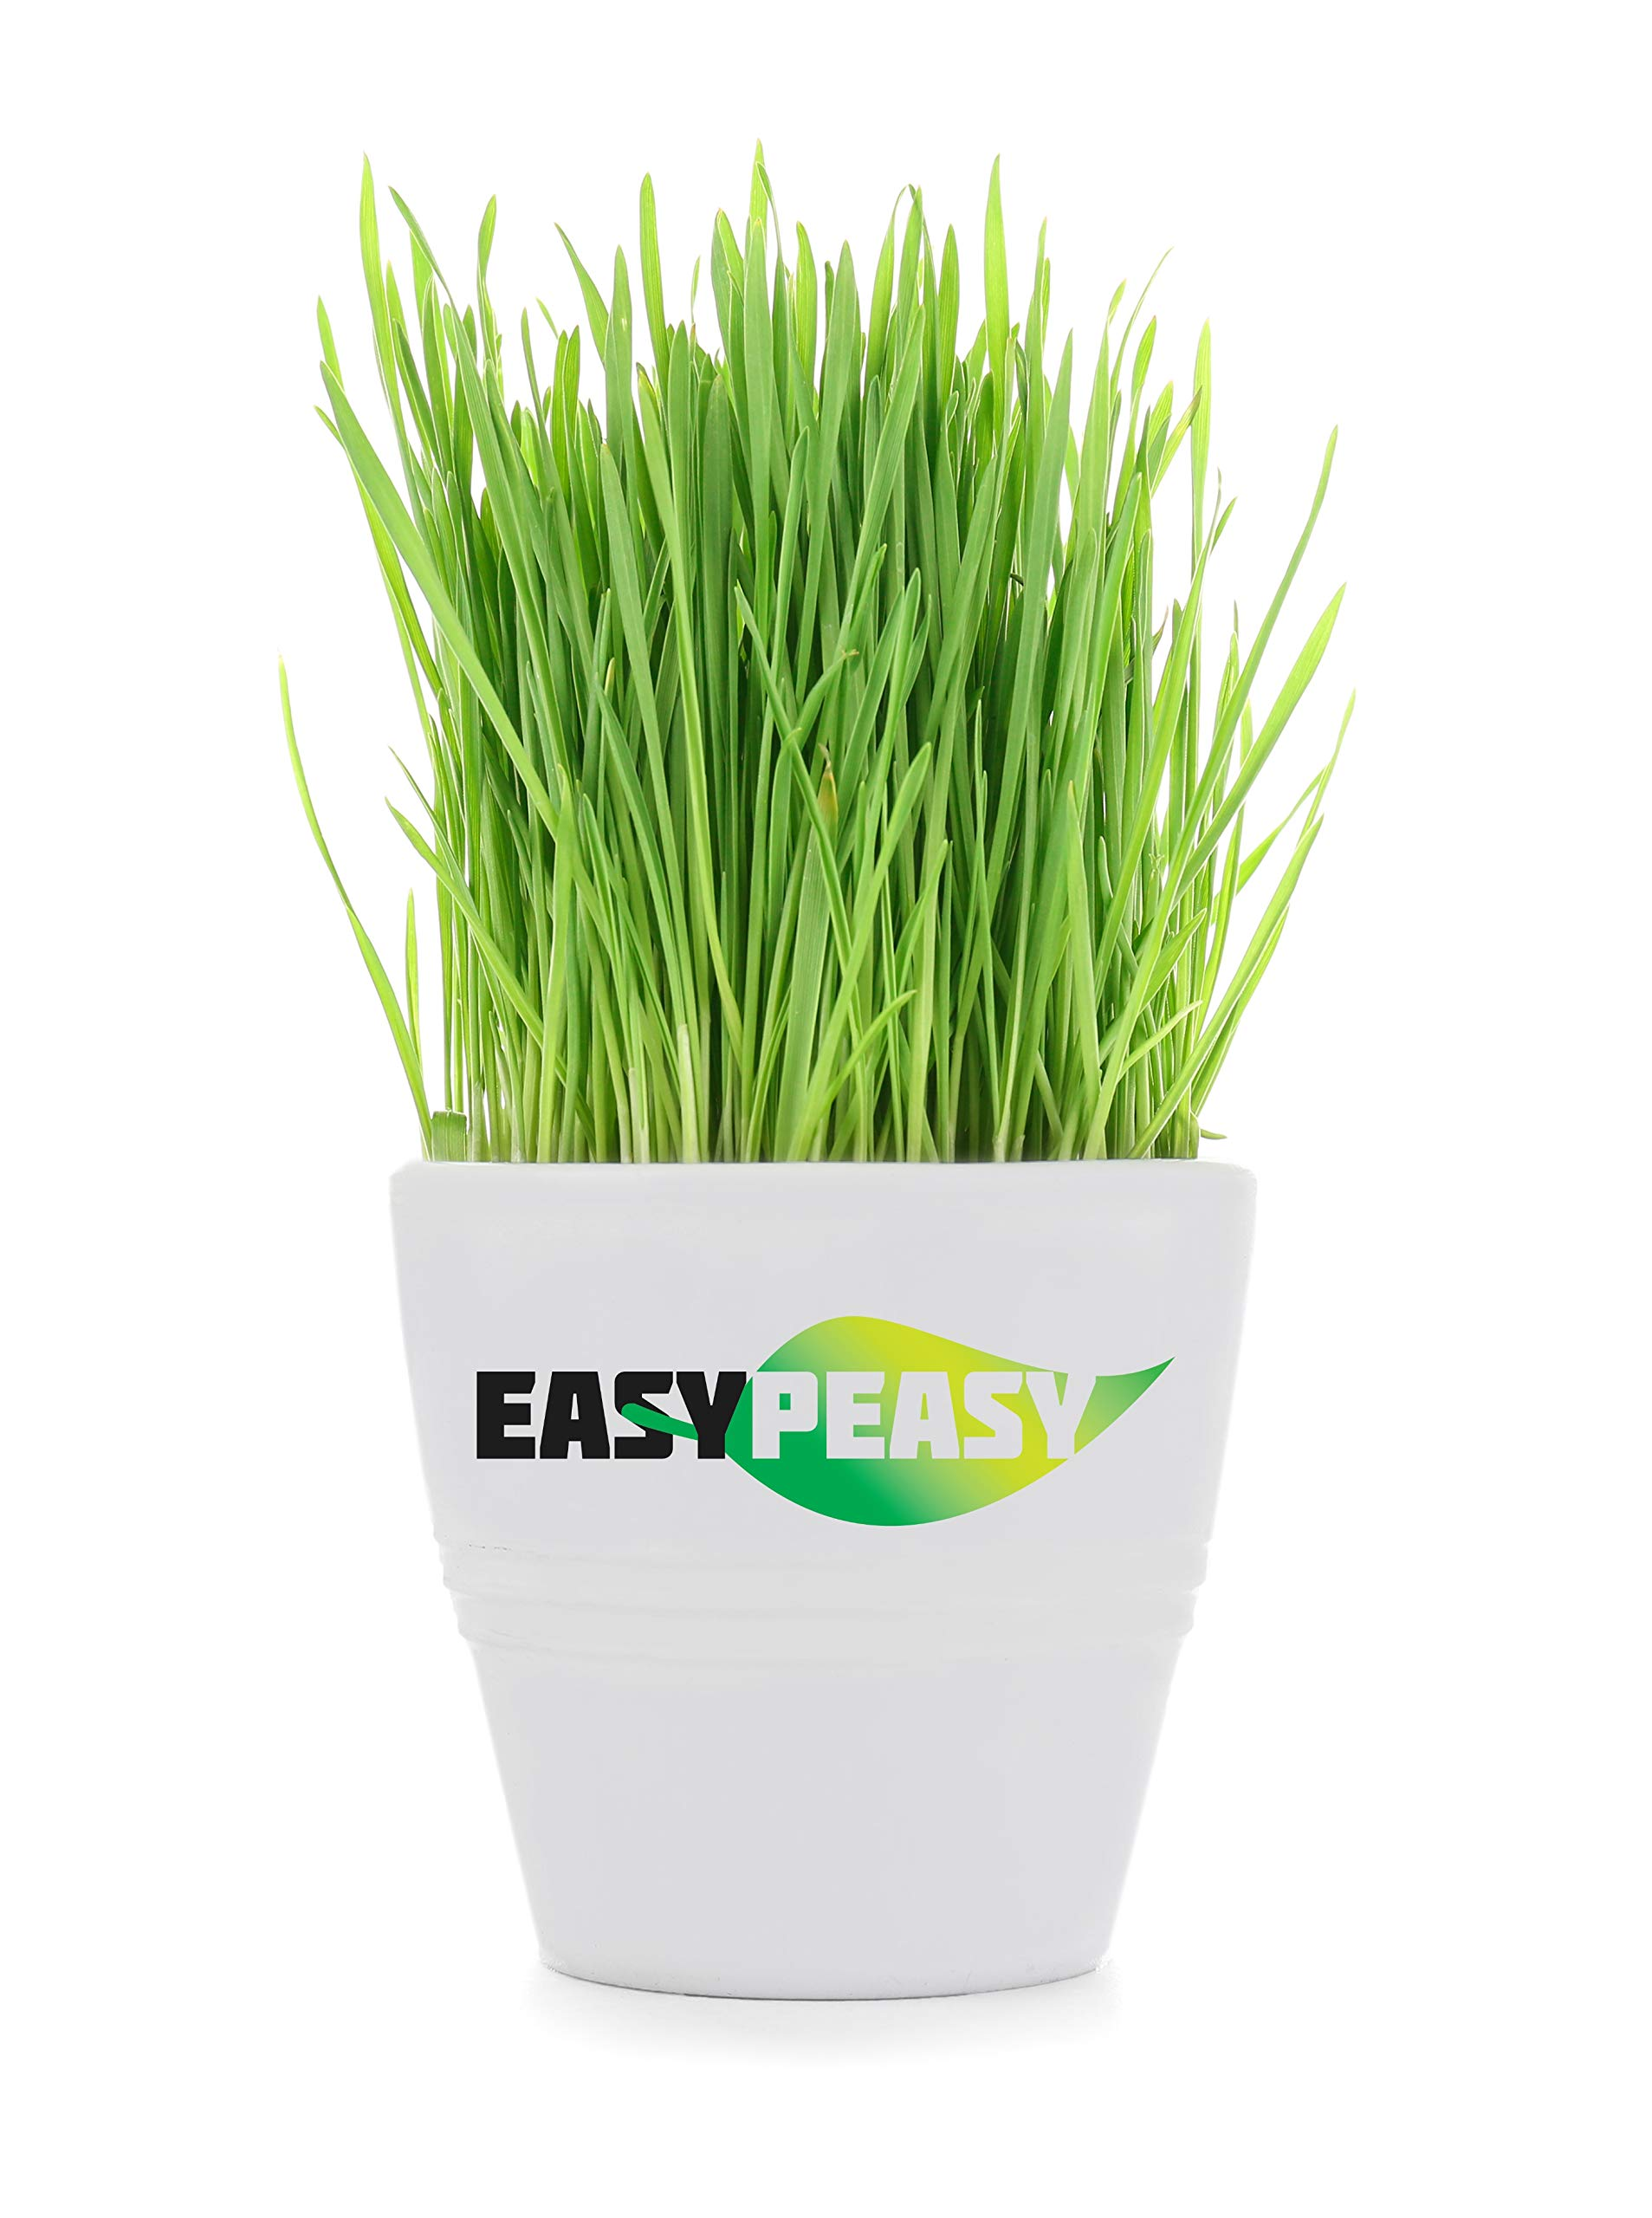 Wheatgrass Seeds, Five Pound, Cat Grass Seeds, Non-GMO, Organic, 5LB